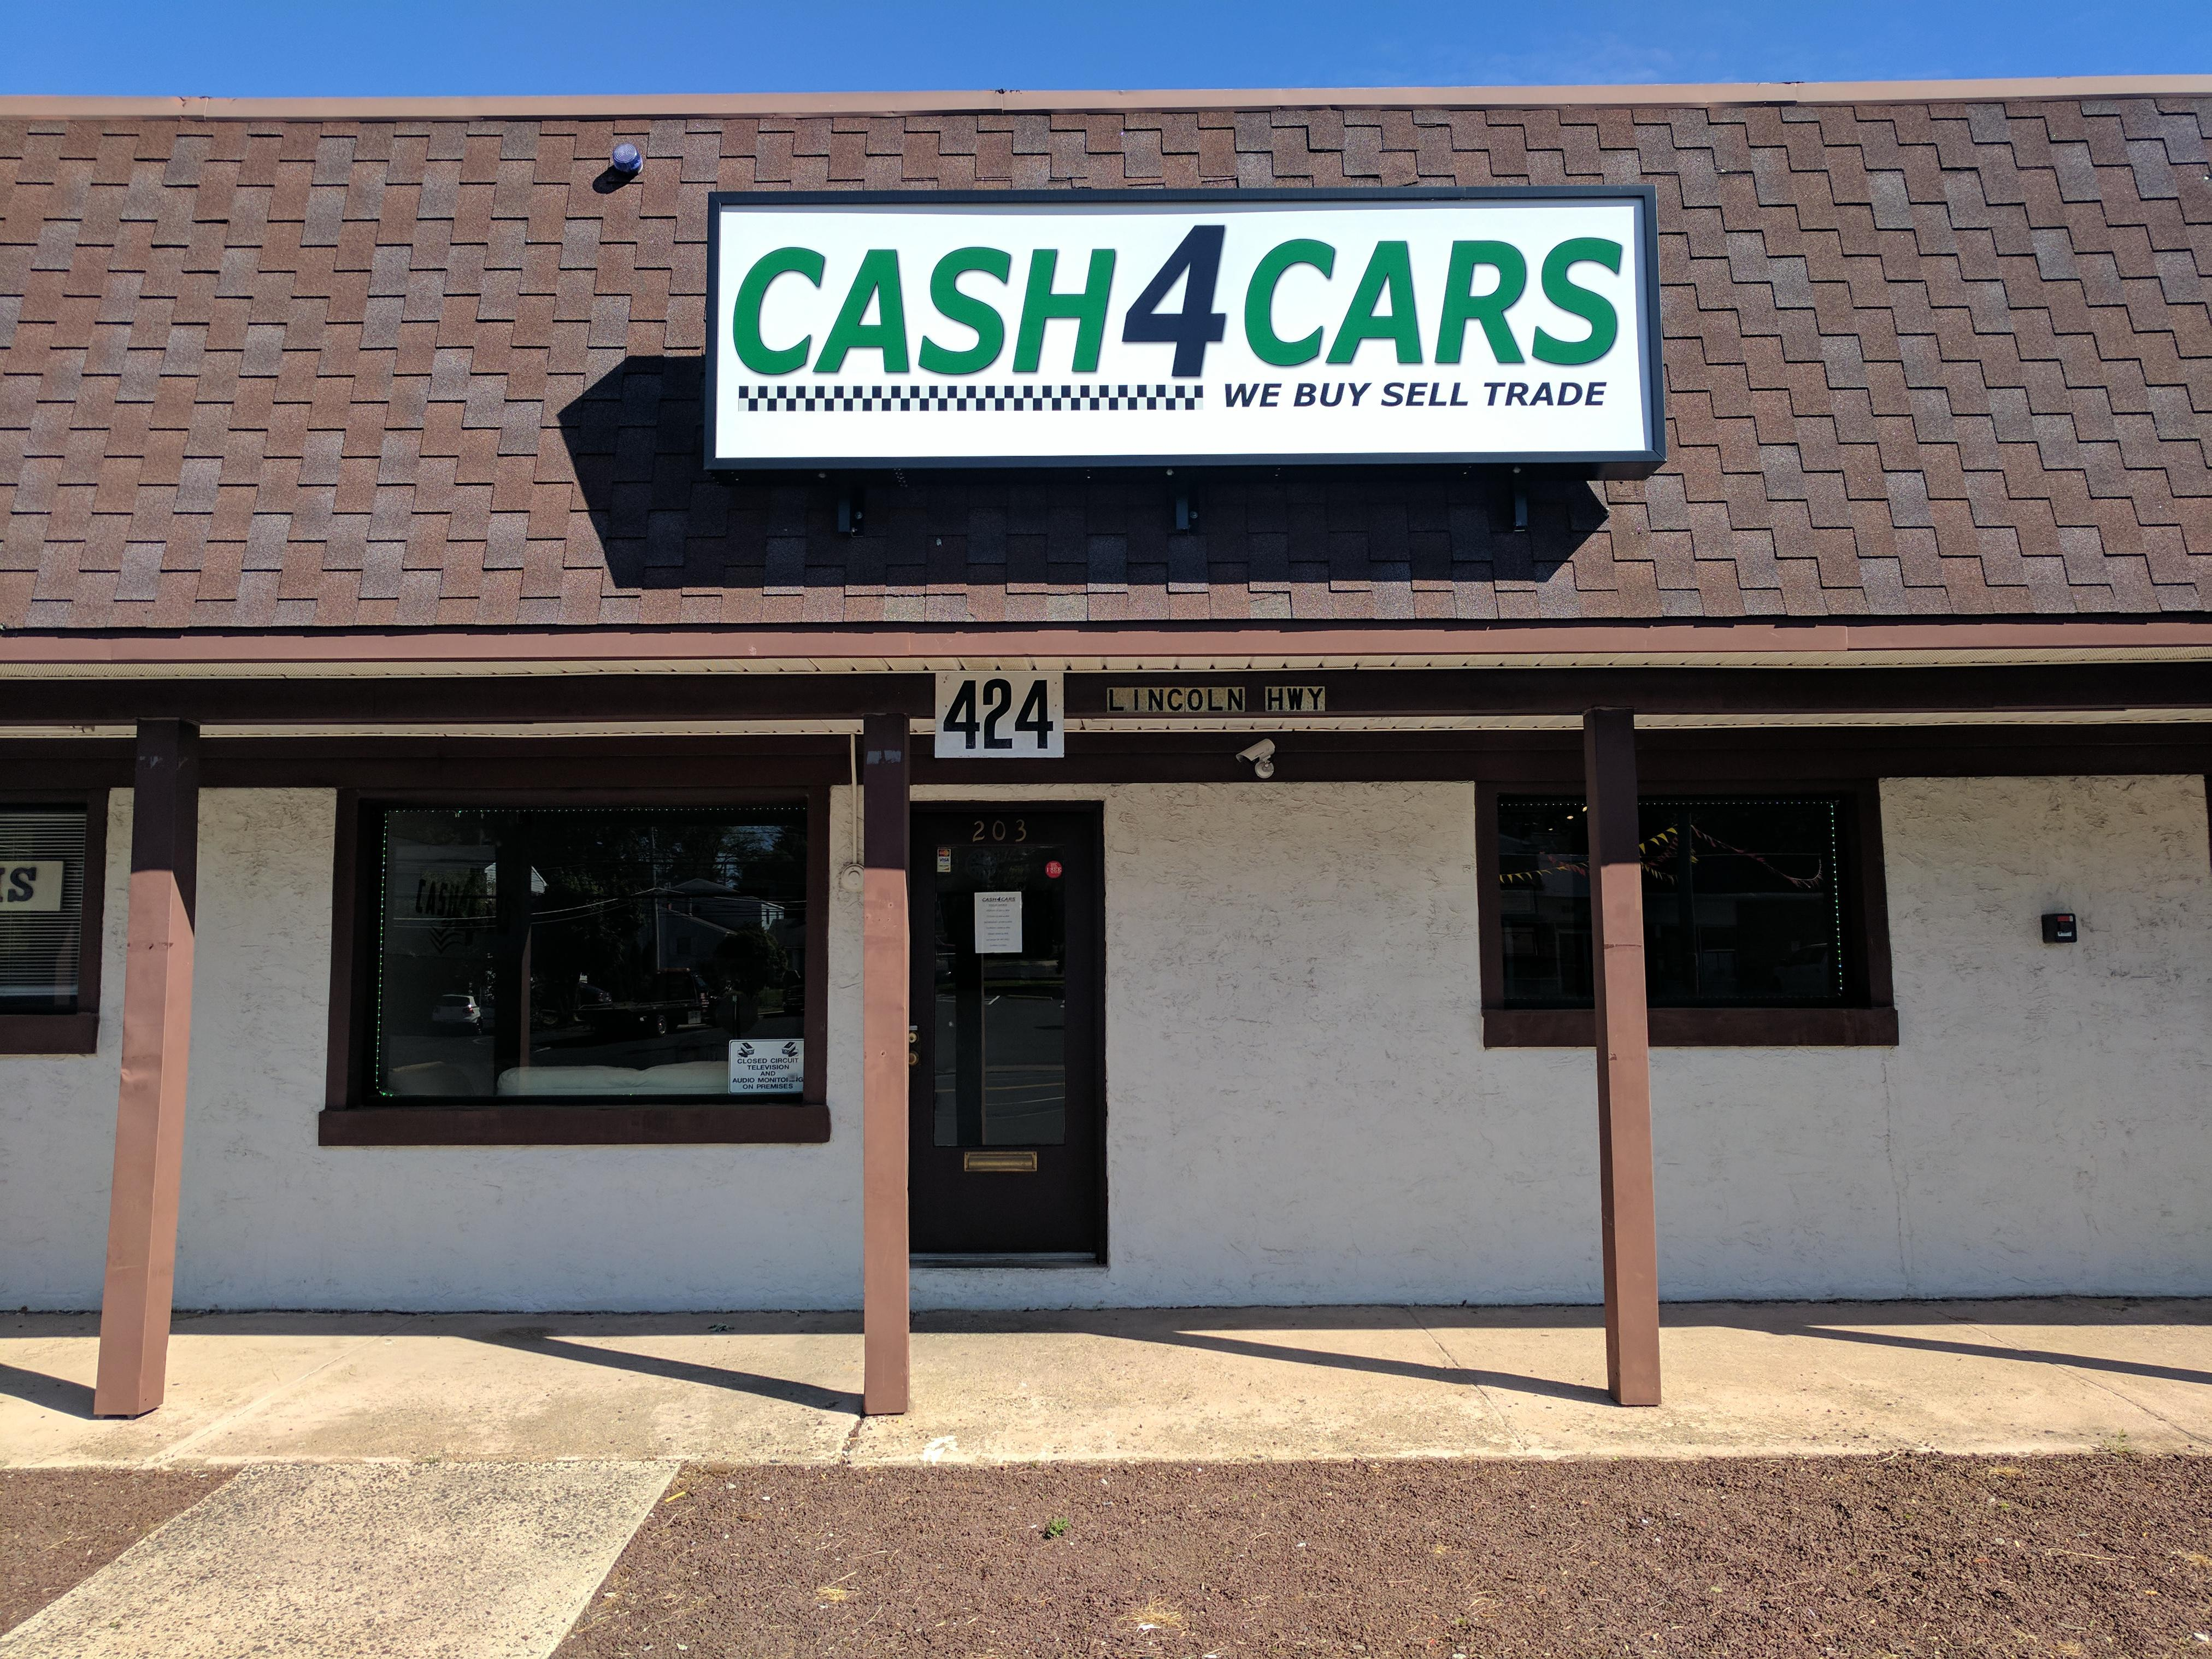 Cash 4 Cars image 1